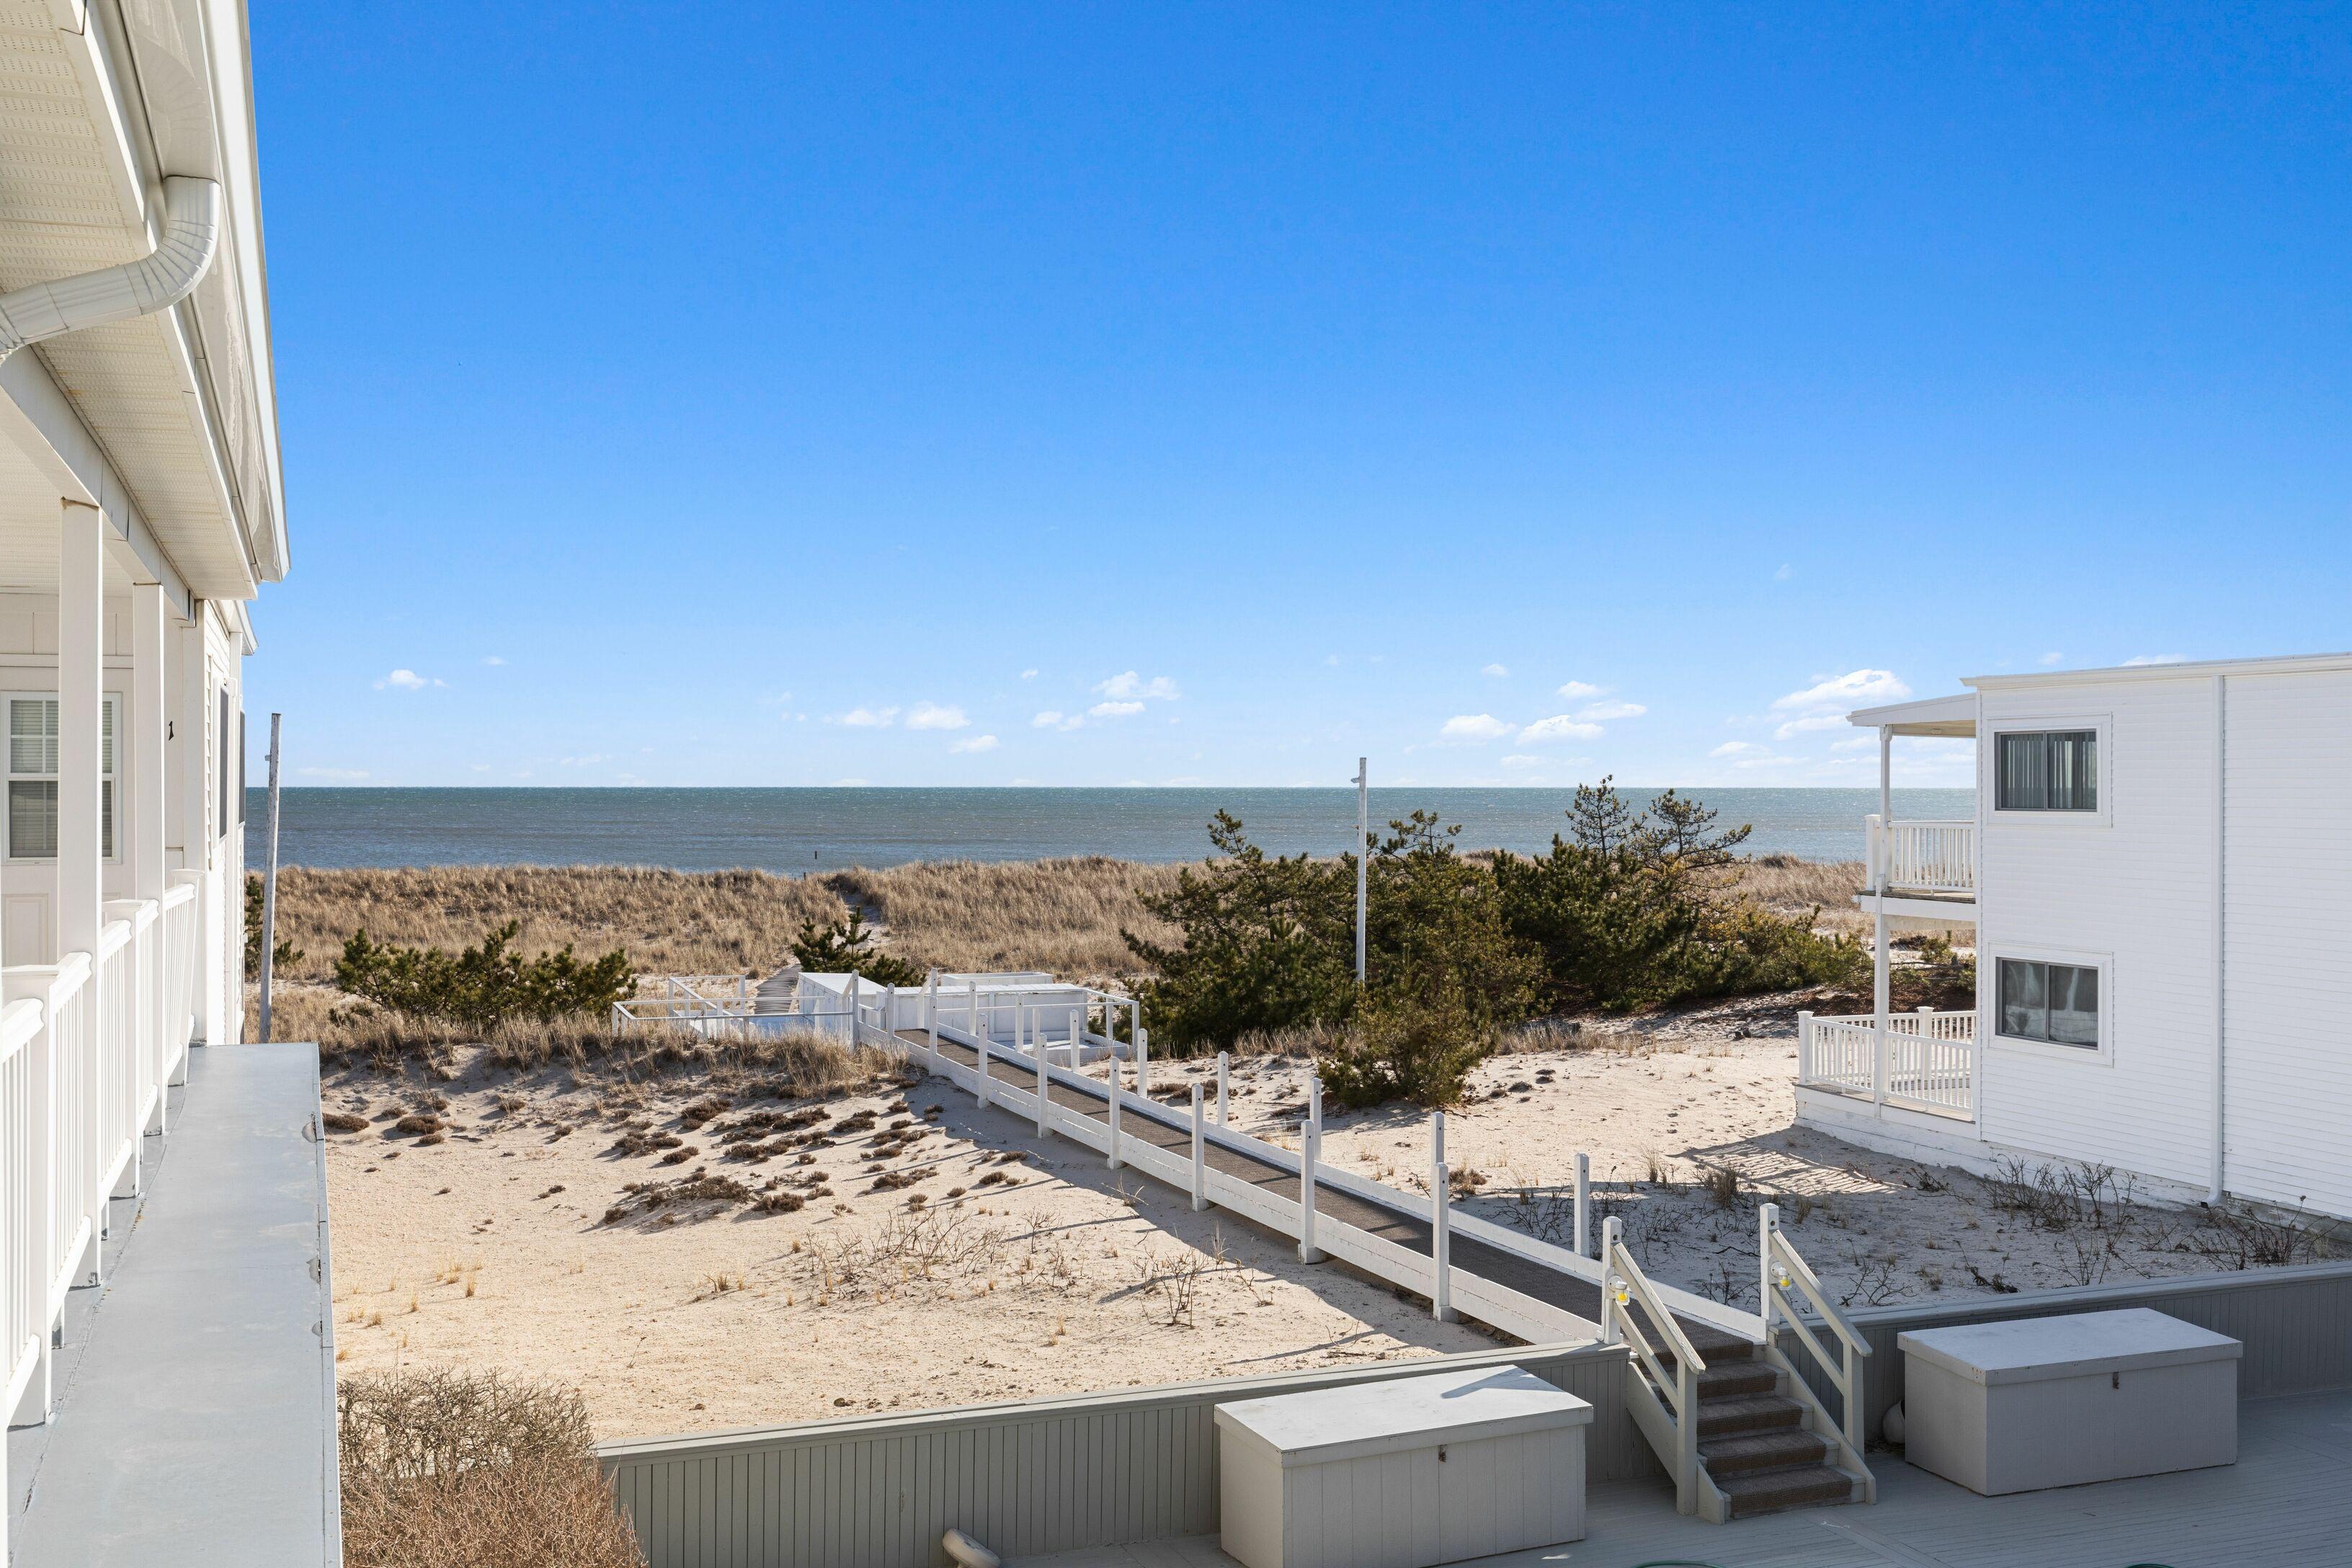 281 Dune Rd - Westhampton Beach South, New York